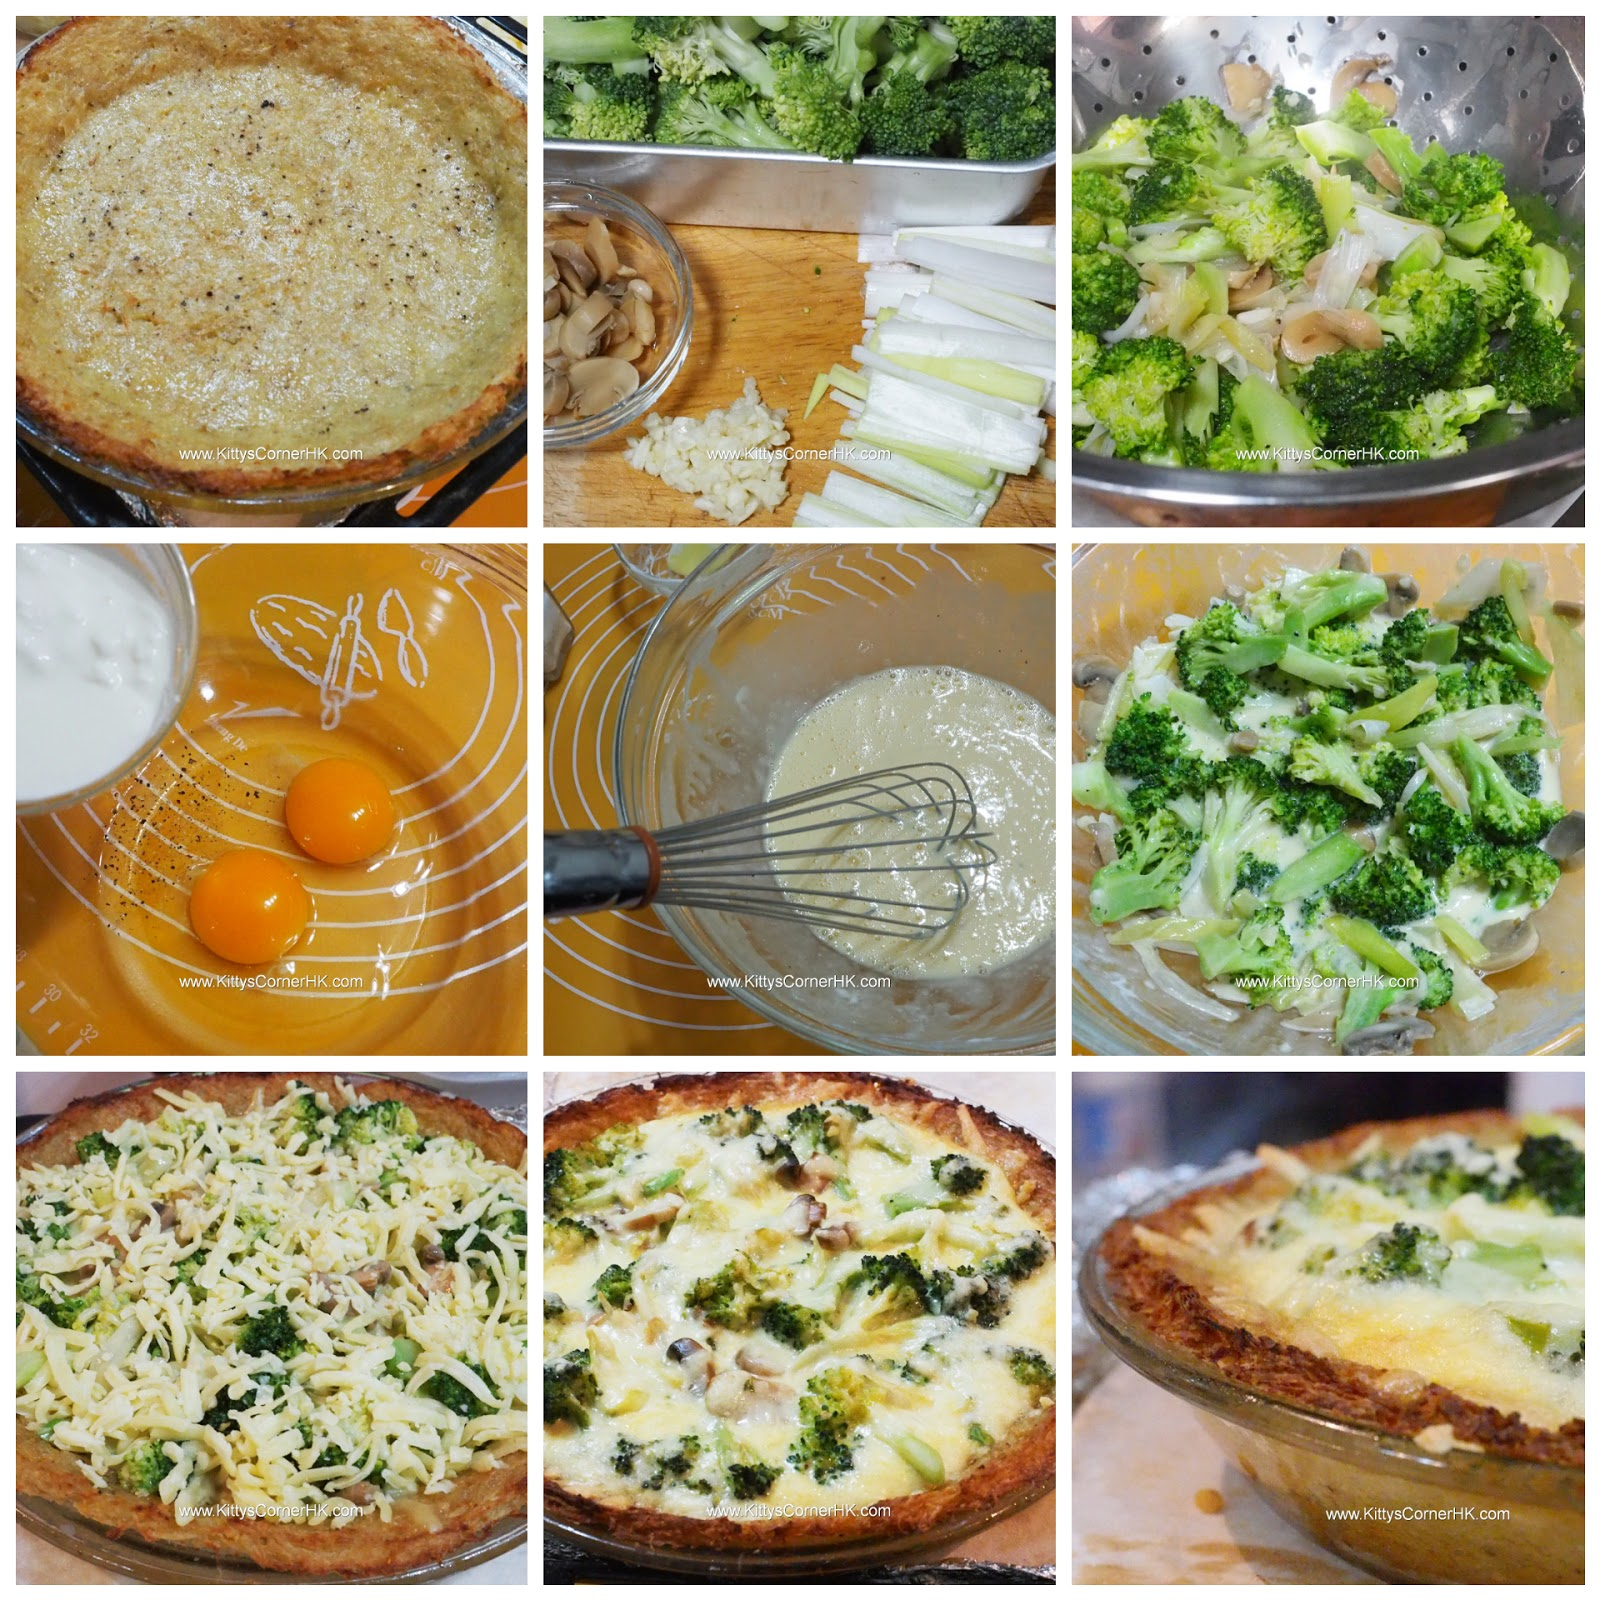 Broccoli and Cheese in Crispy Potato Crust DIY recipe  西蘭花芝士香脆薯底批 自家烘焙食譜